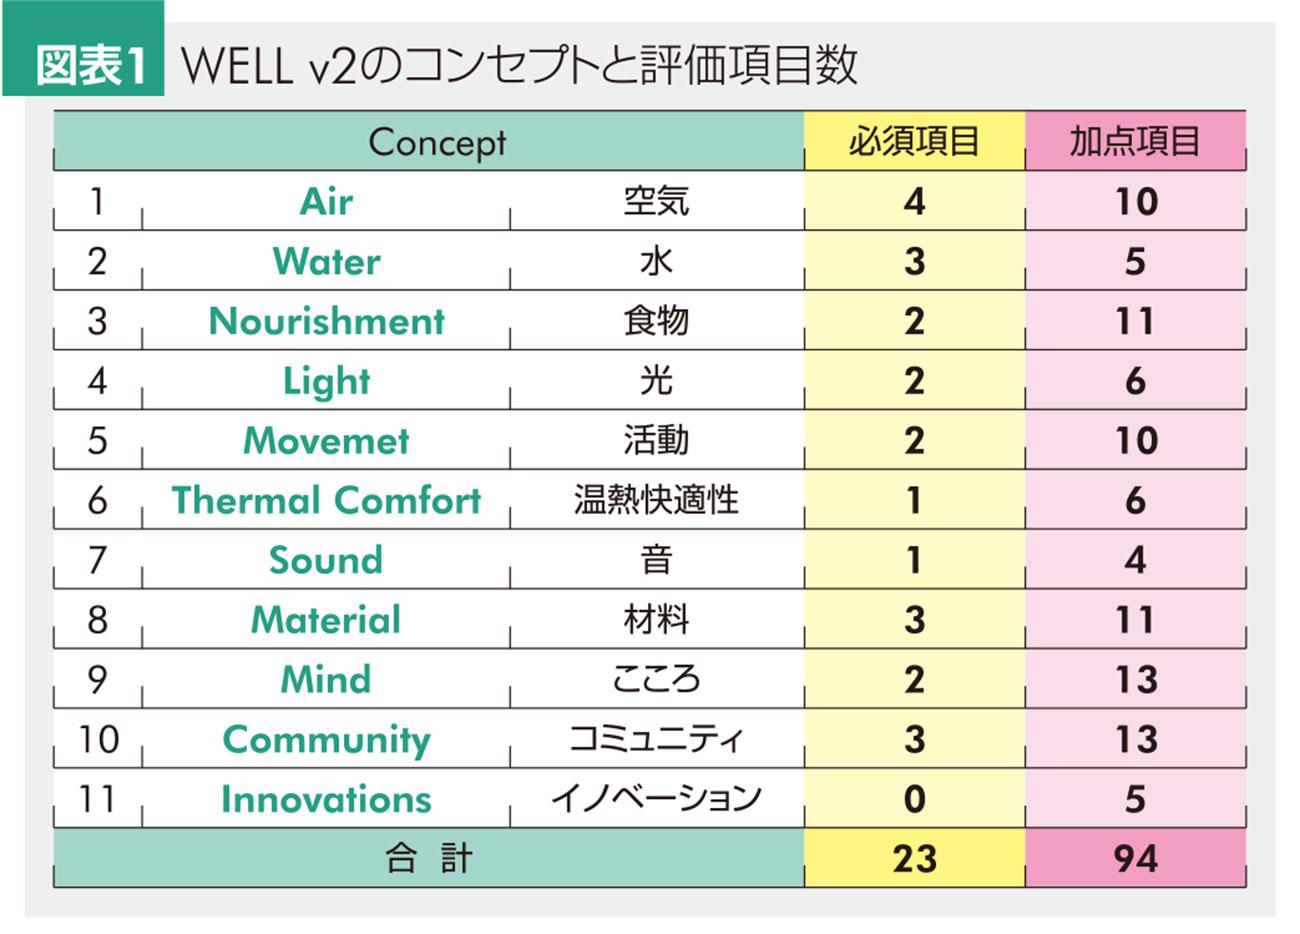 WELL v2のコンセプトと評価項目数